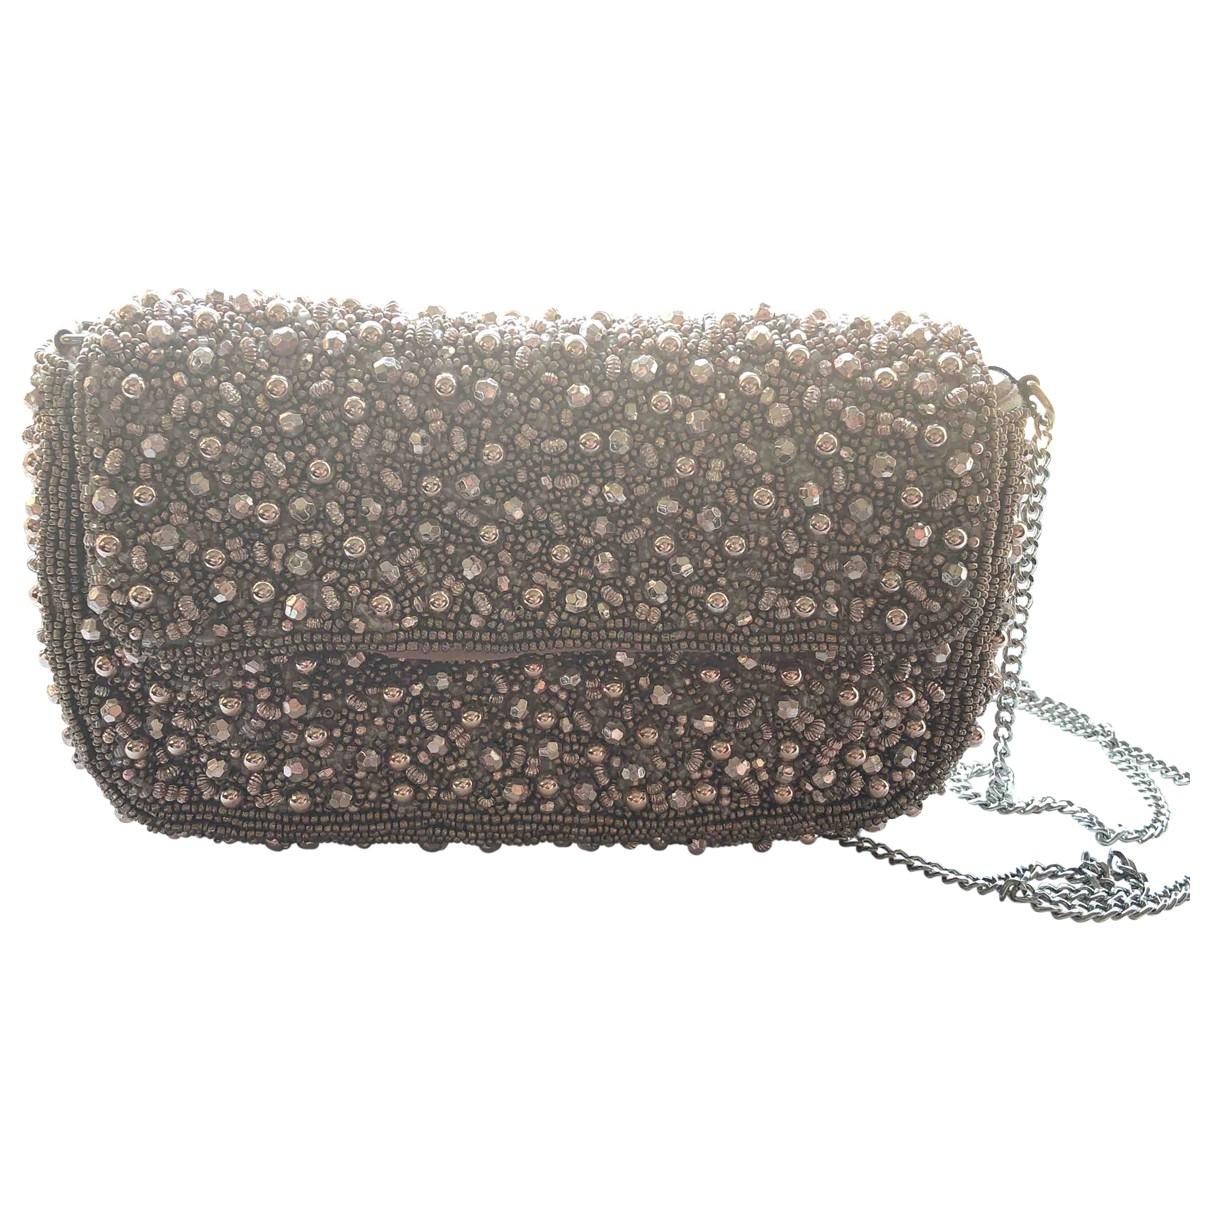 Bolsos clutch en Algodon Zara